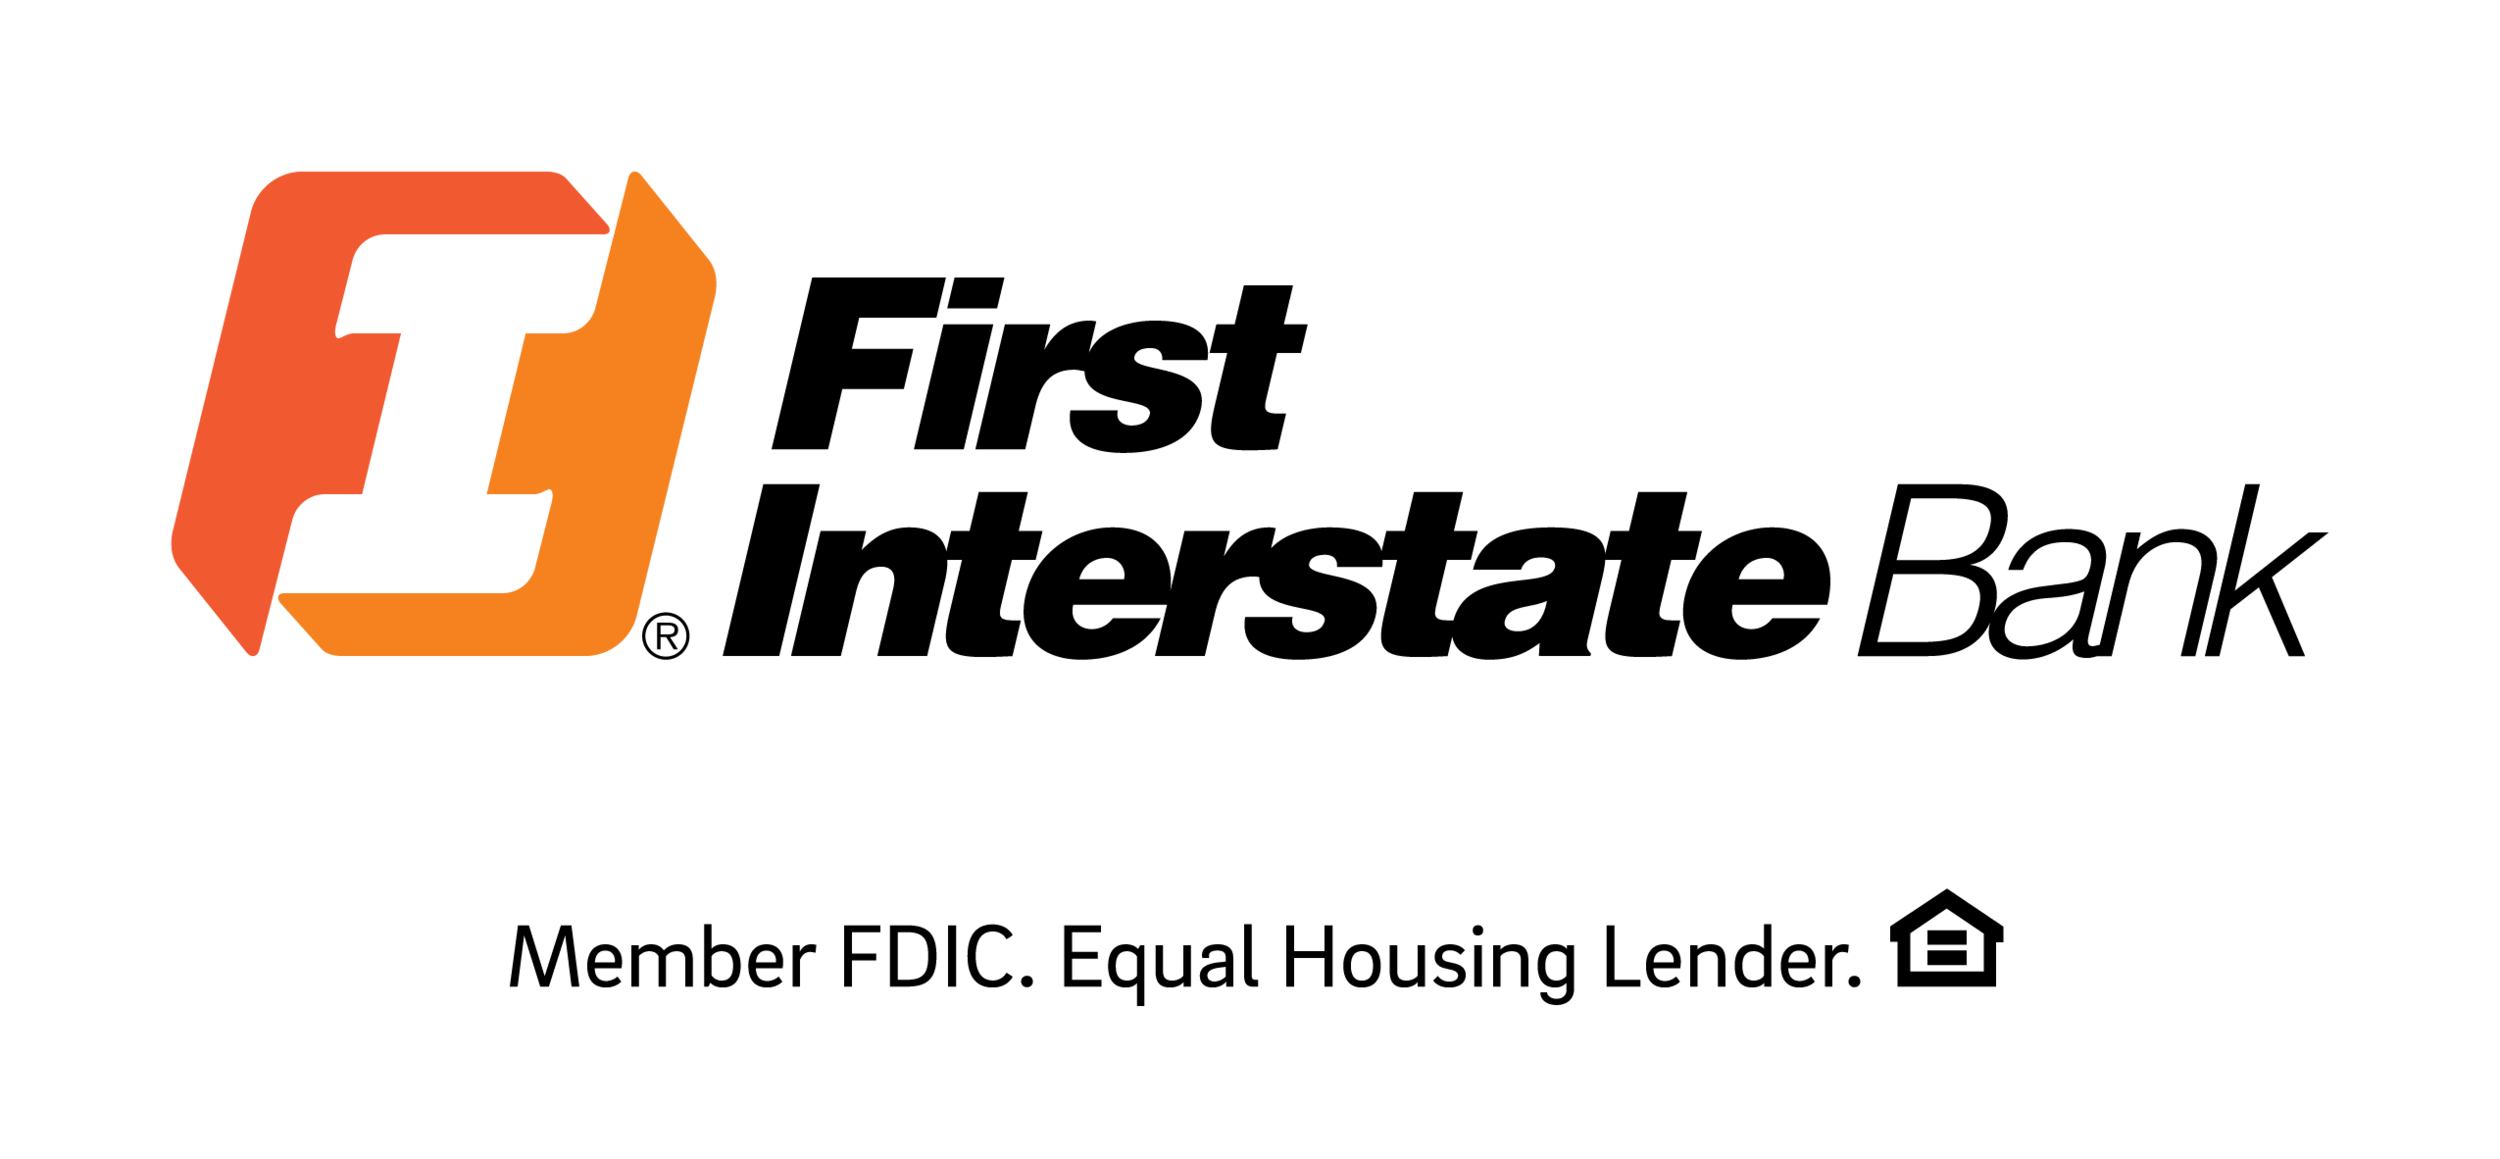 FIB_LogoLockup_2Line-FDIC-EHL-1_LtBkgd_RGB_lrg.png